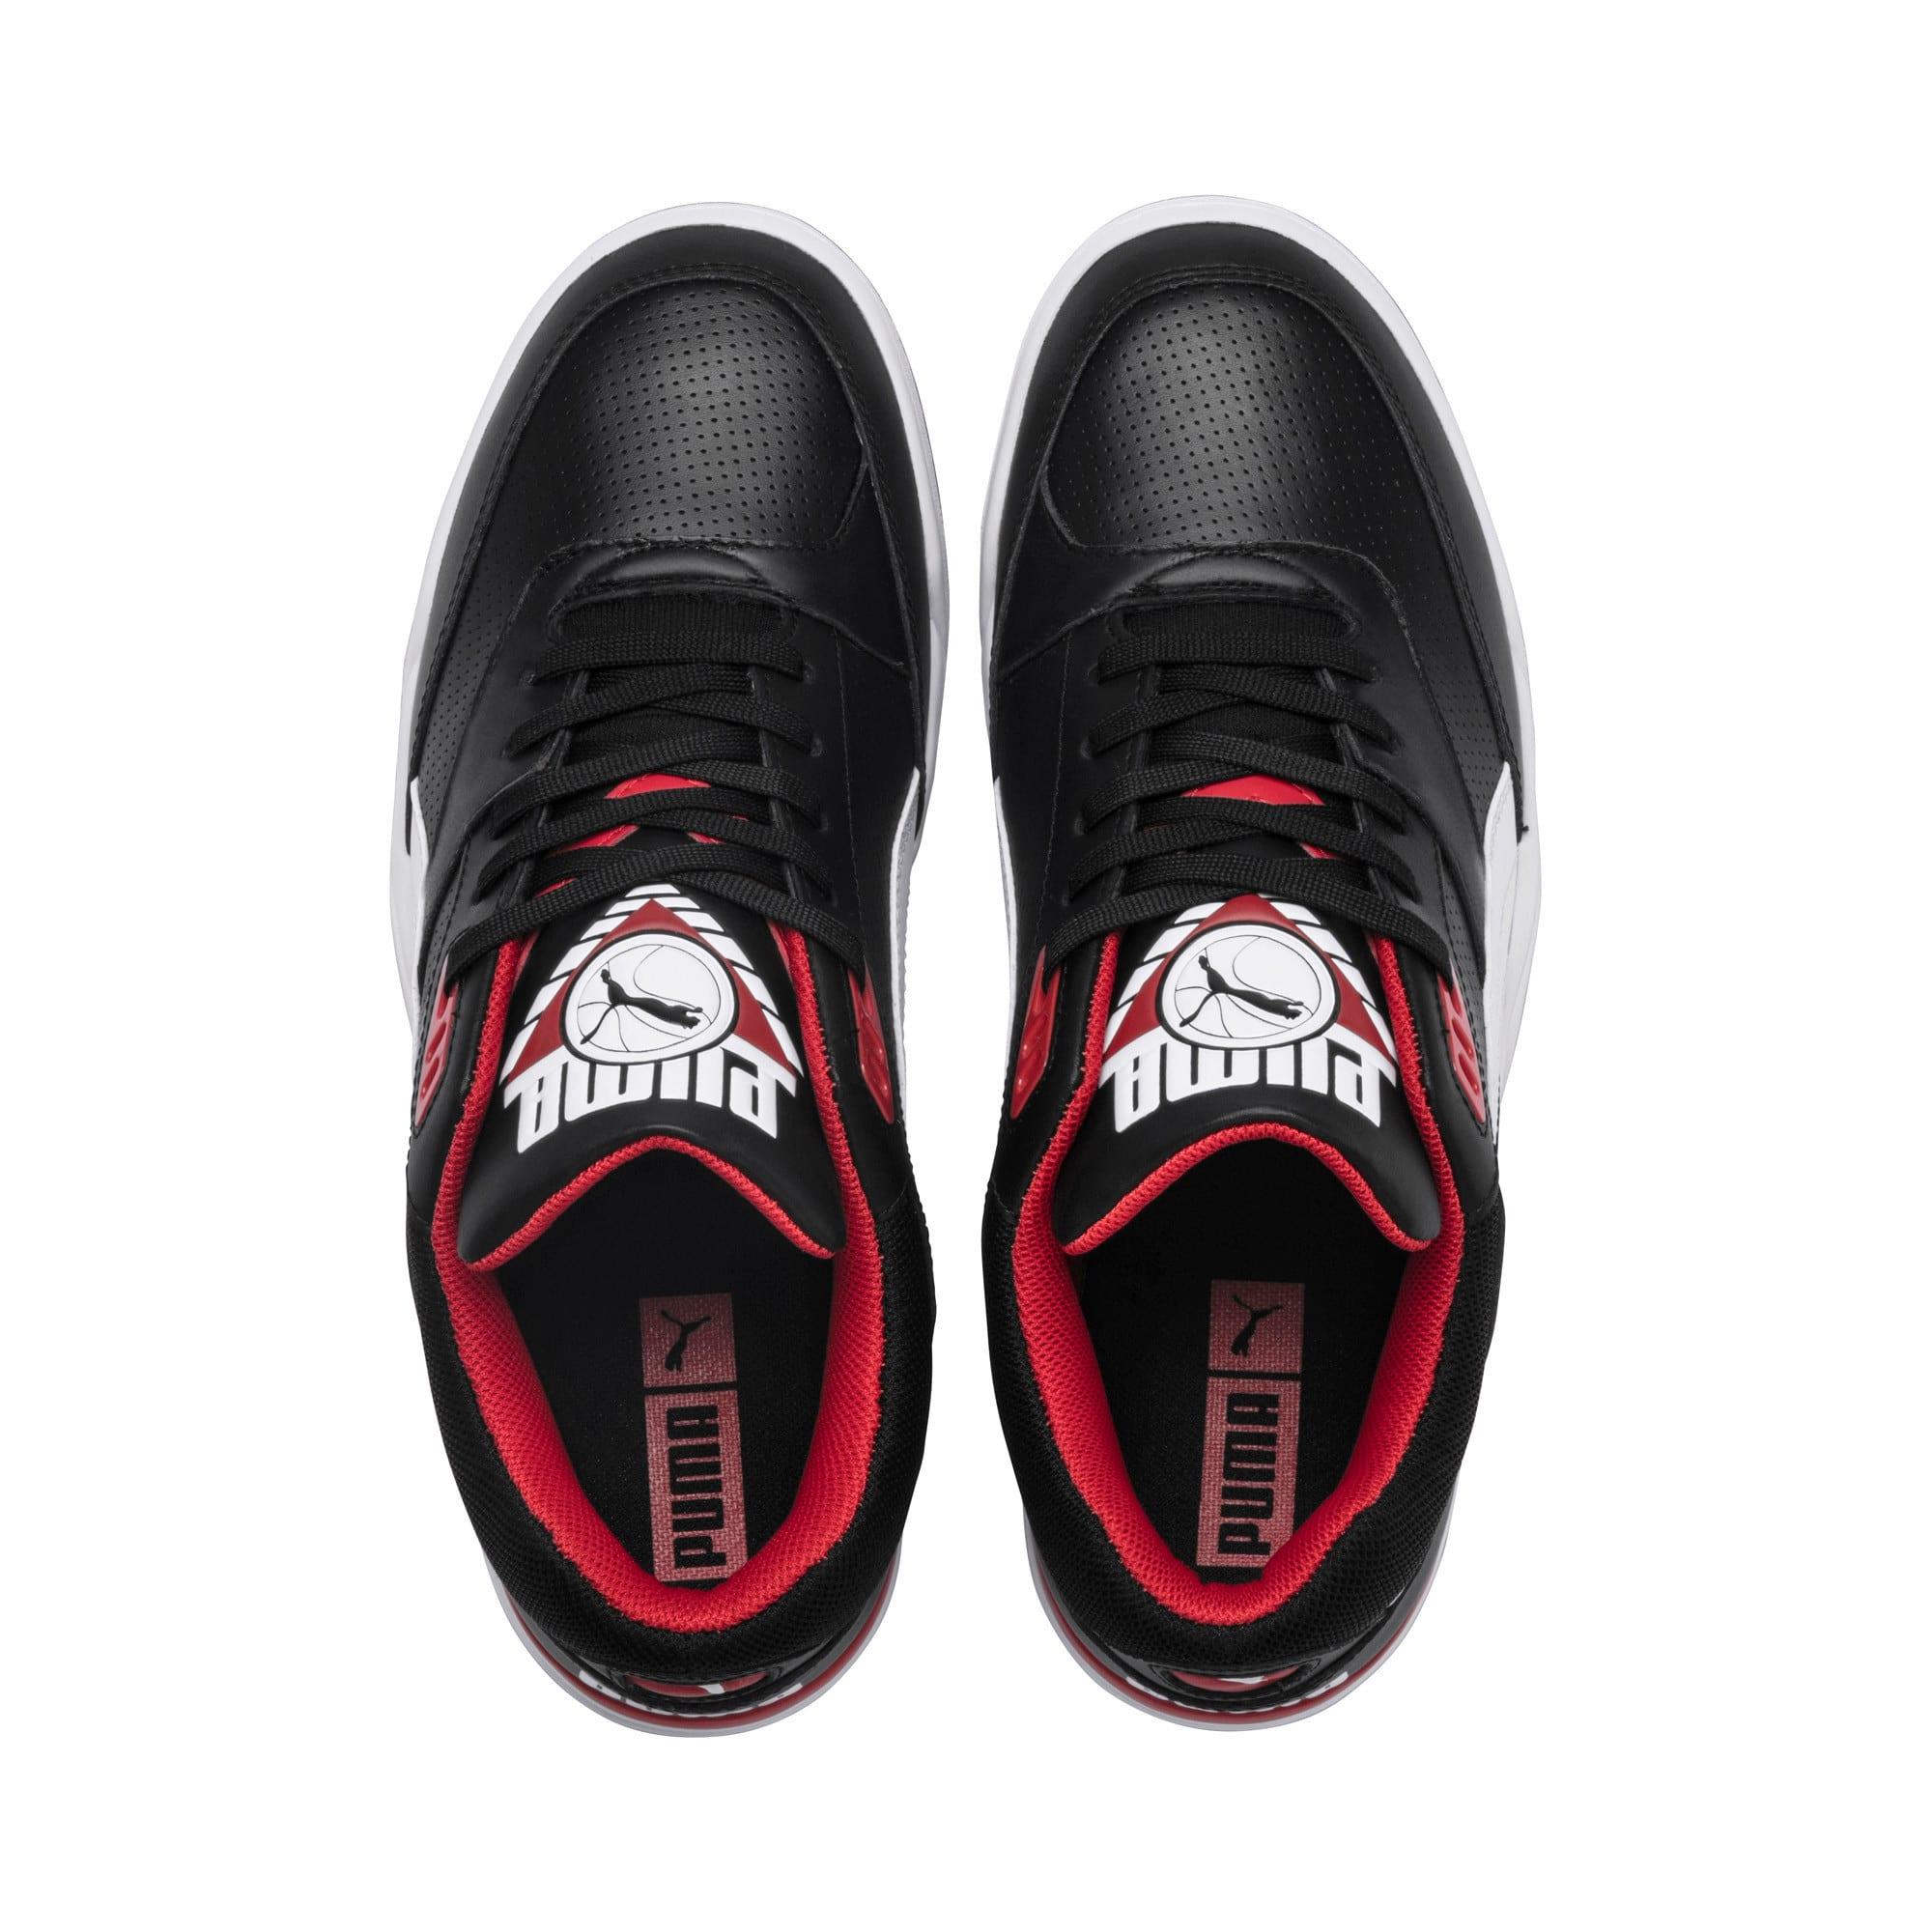 Thumbnail 6 of Basket Palace Guard, Puma Black-Puma White-red, medium